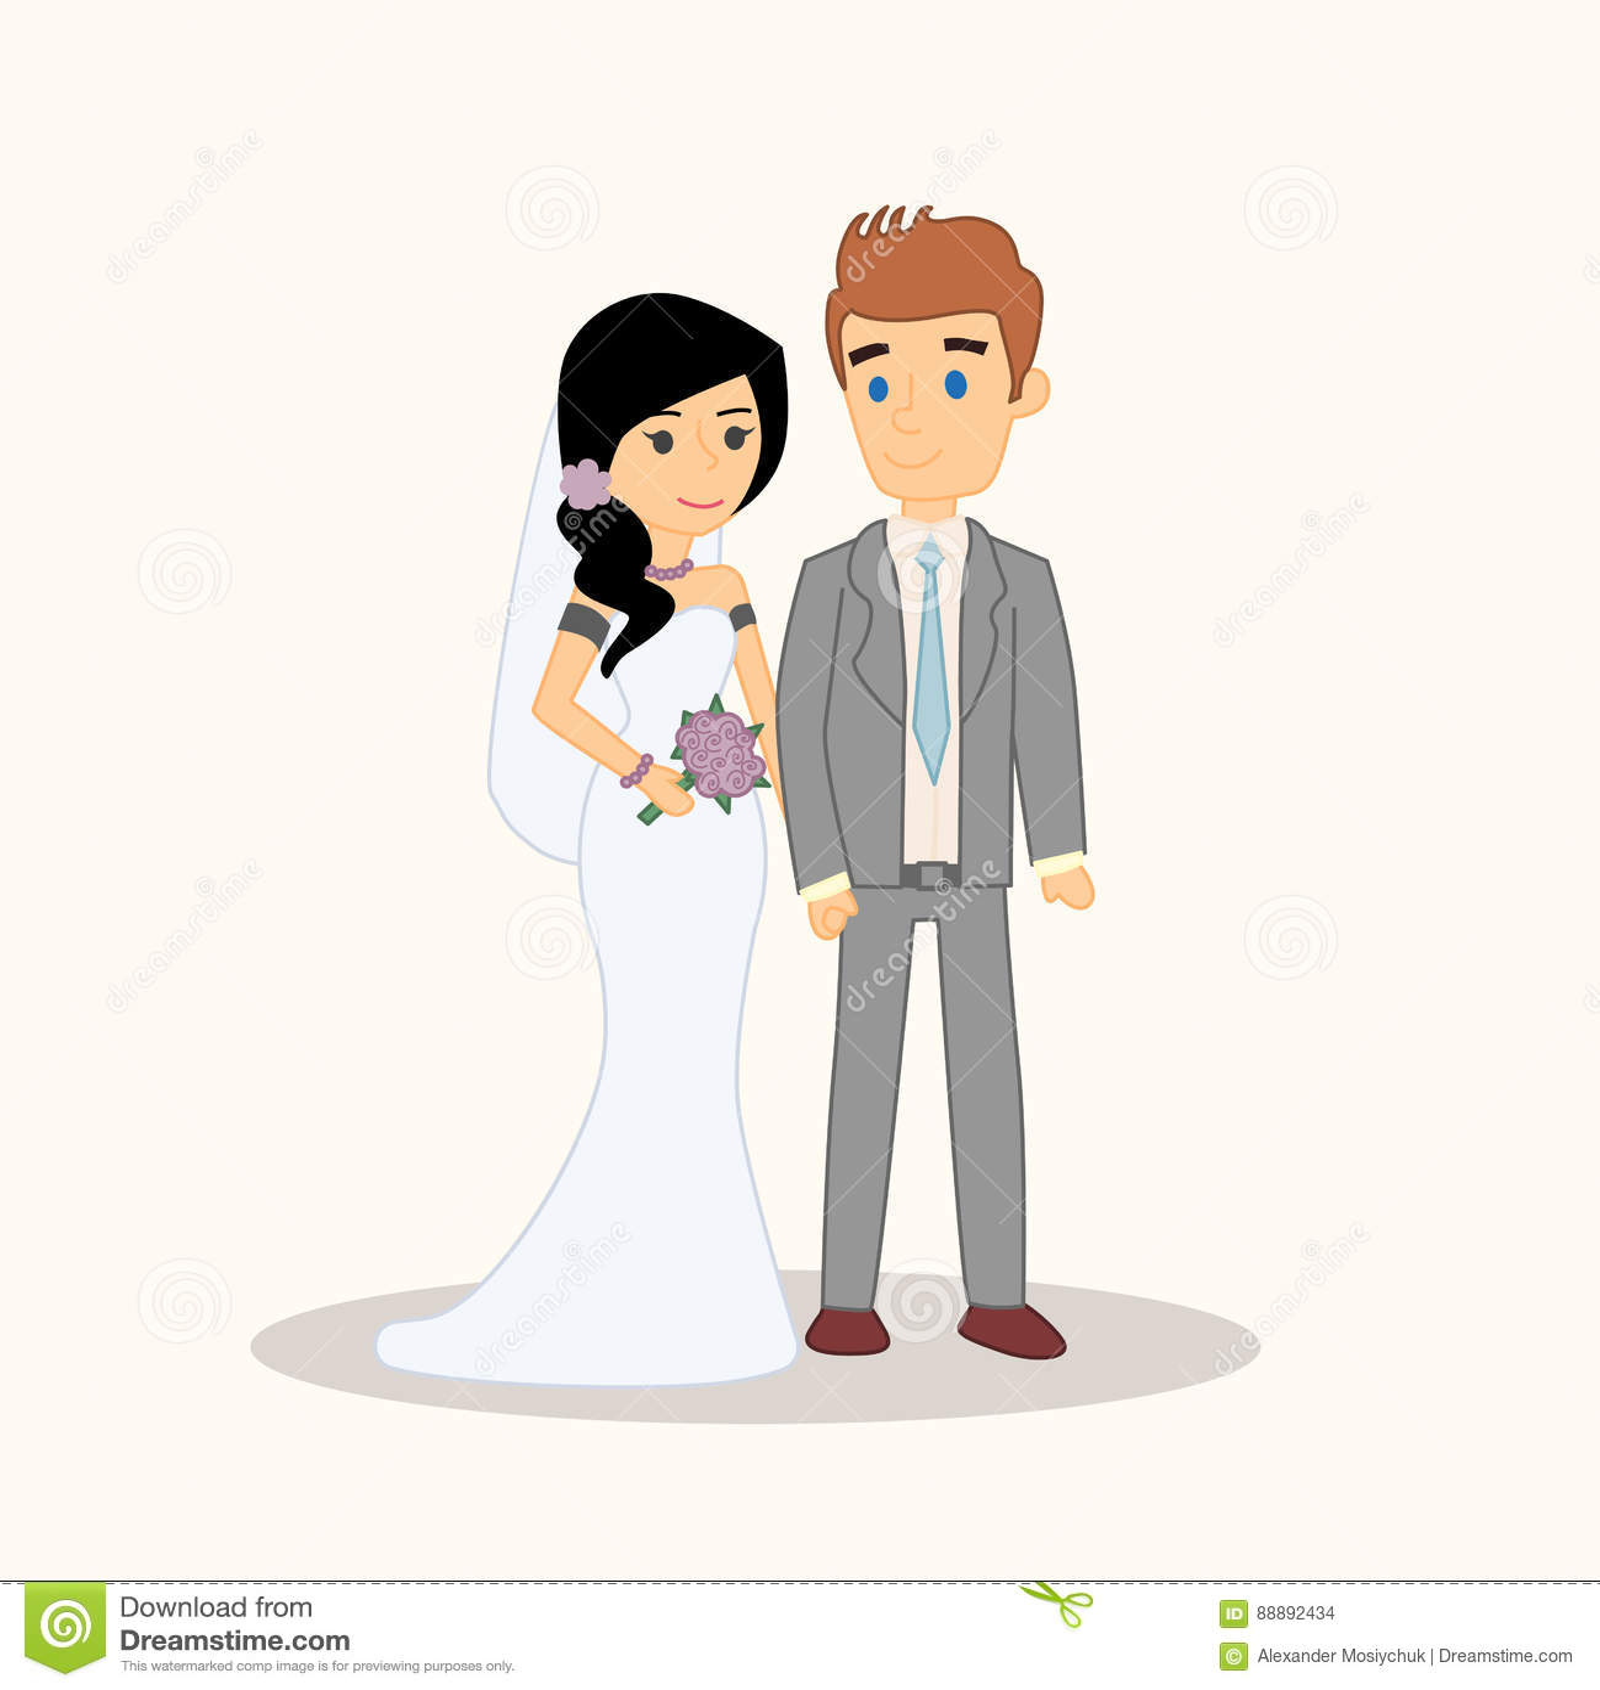 Wedding couple cartoon characters bride and groom vector wedding couple people characters isolated vector bride and groom vector illustration for invitation greeting kristyandbryce Gallery